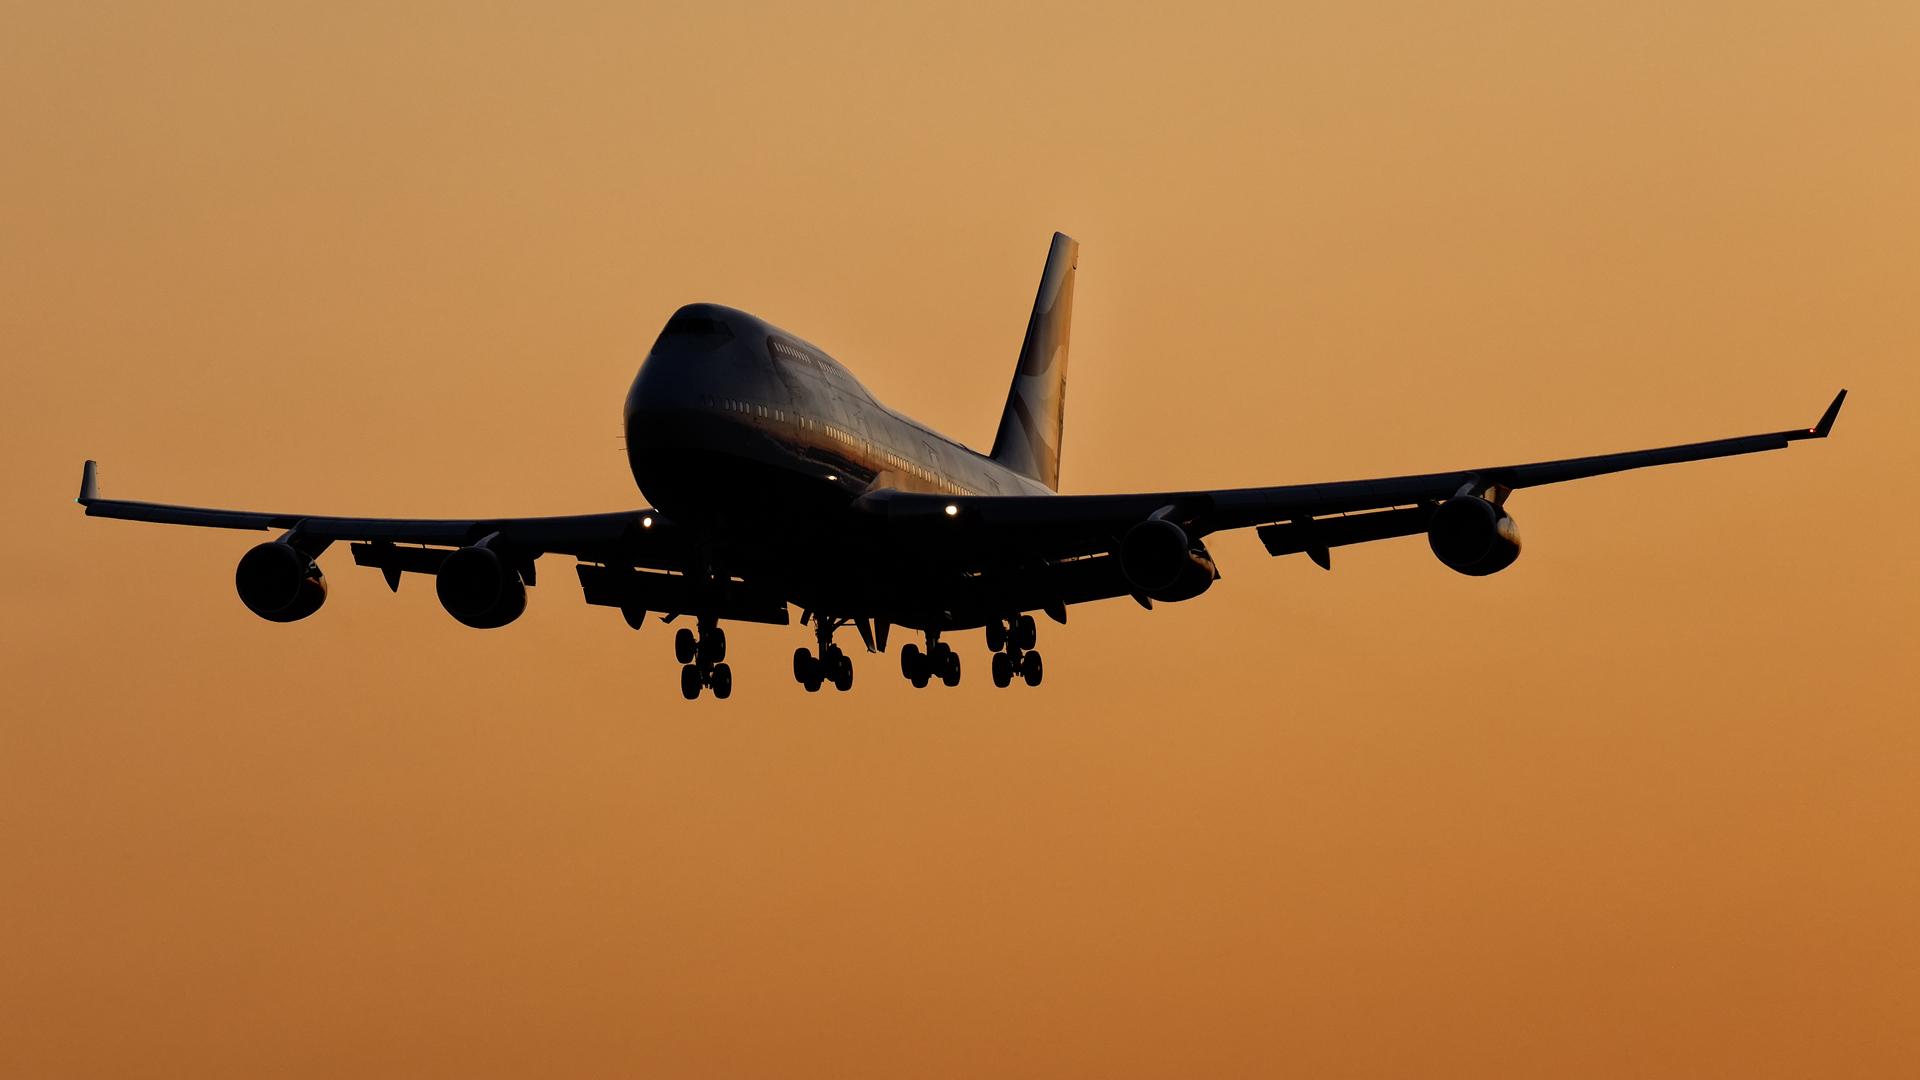 Click image for larger version.  Name:G-BYGA-BA-sunset.jpg Views:17 Size:845.5 KB ID:28472